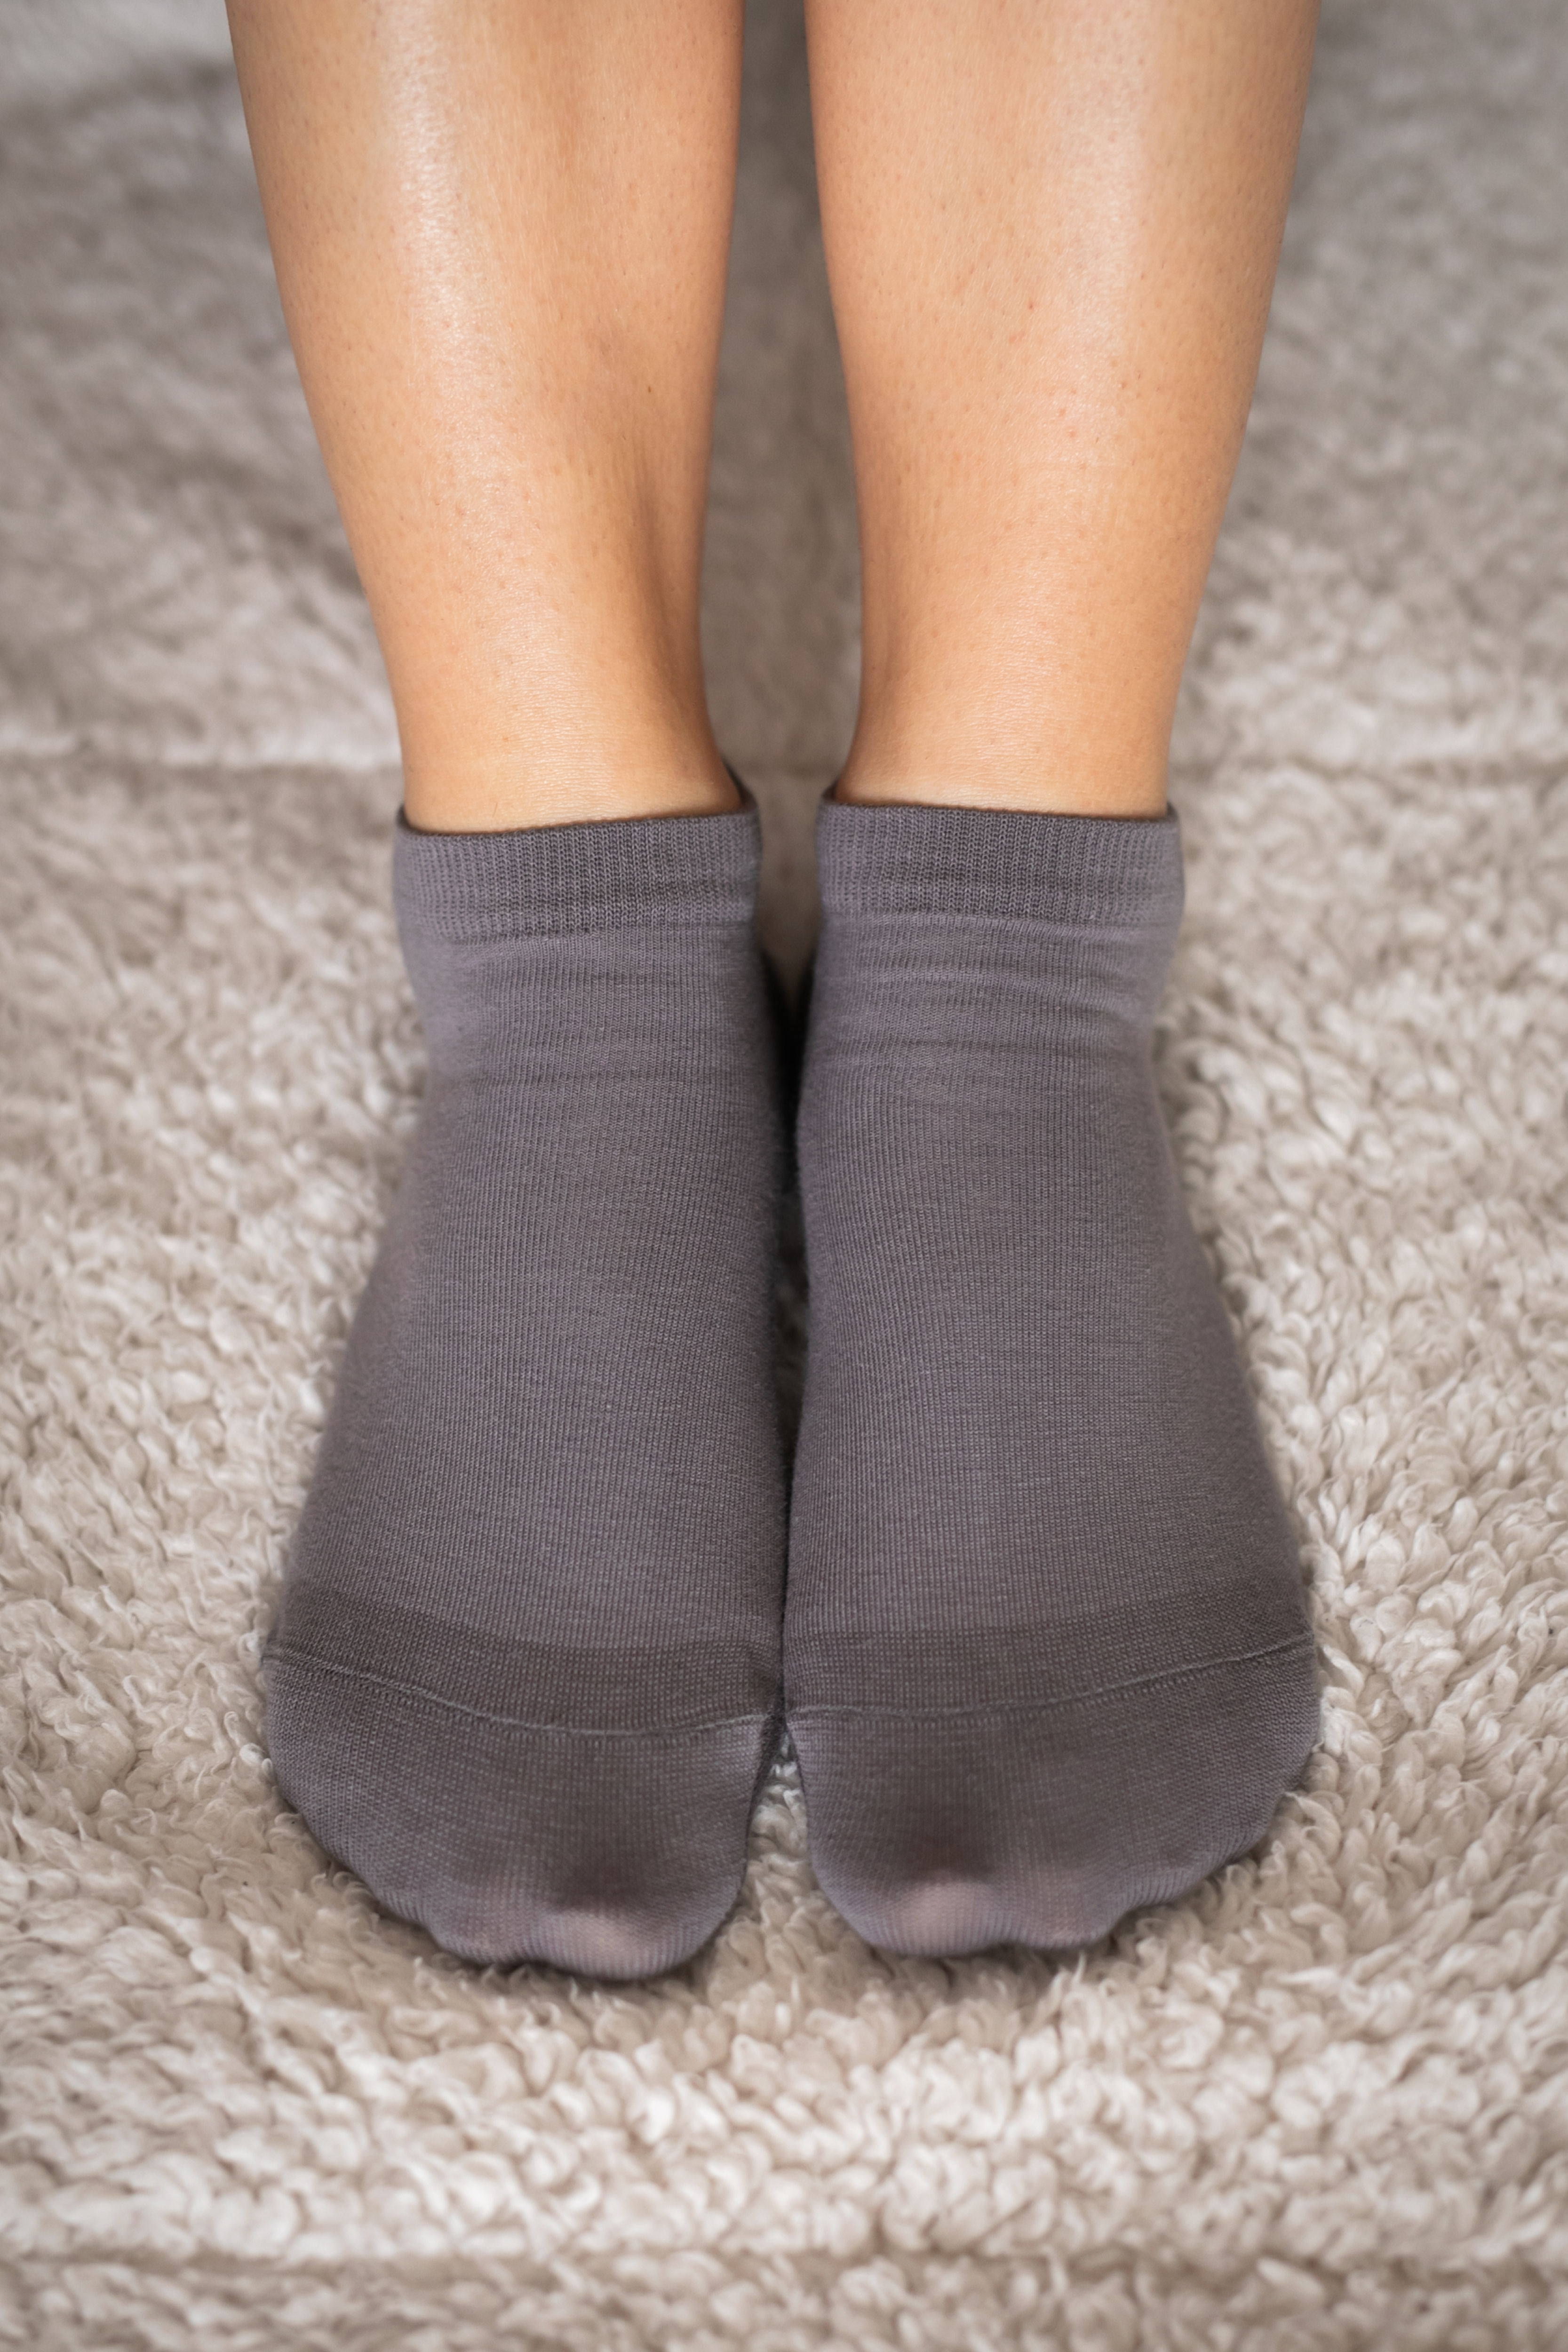 Barfuss-Socken - niedrege - grau 35-38